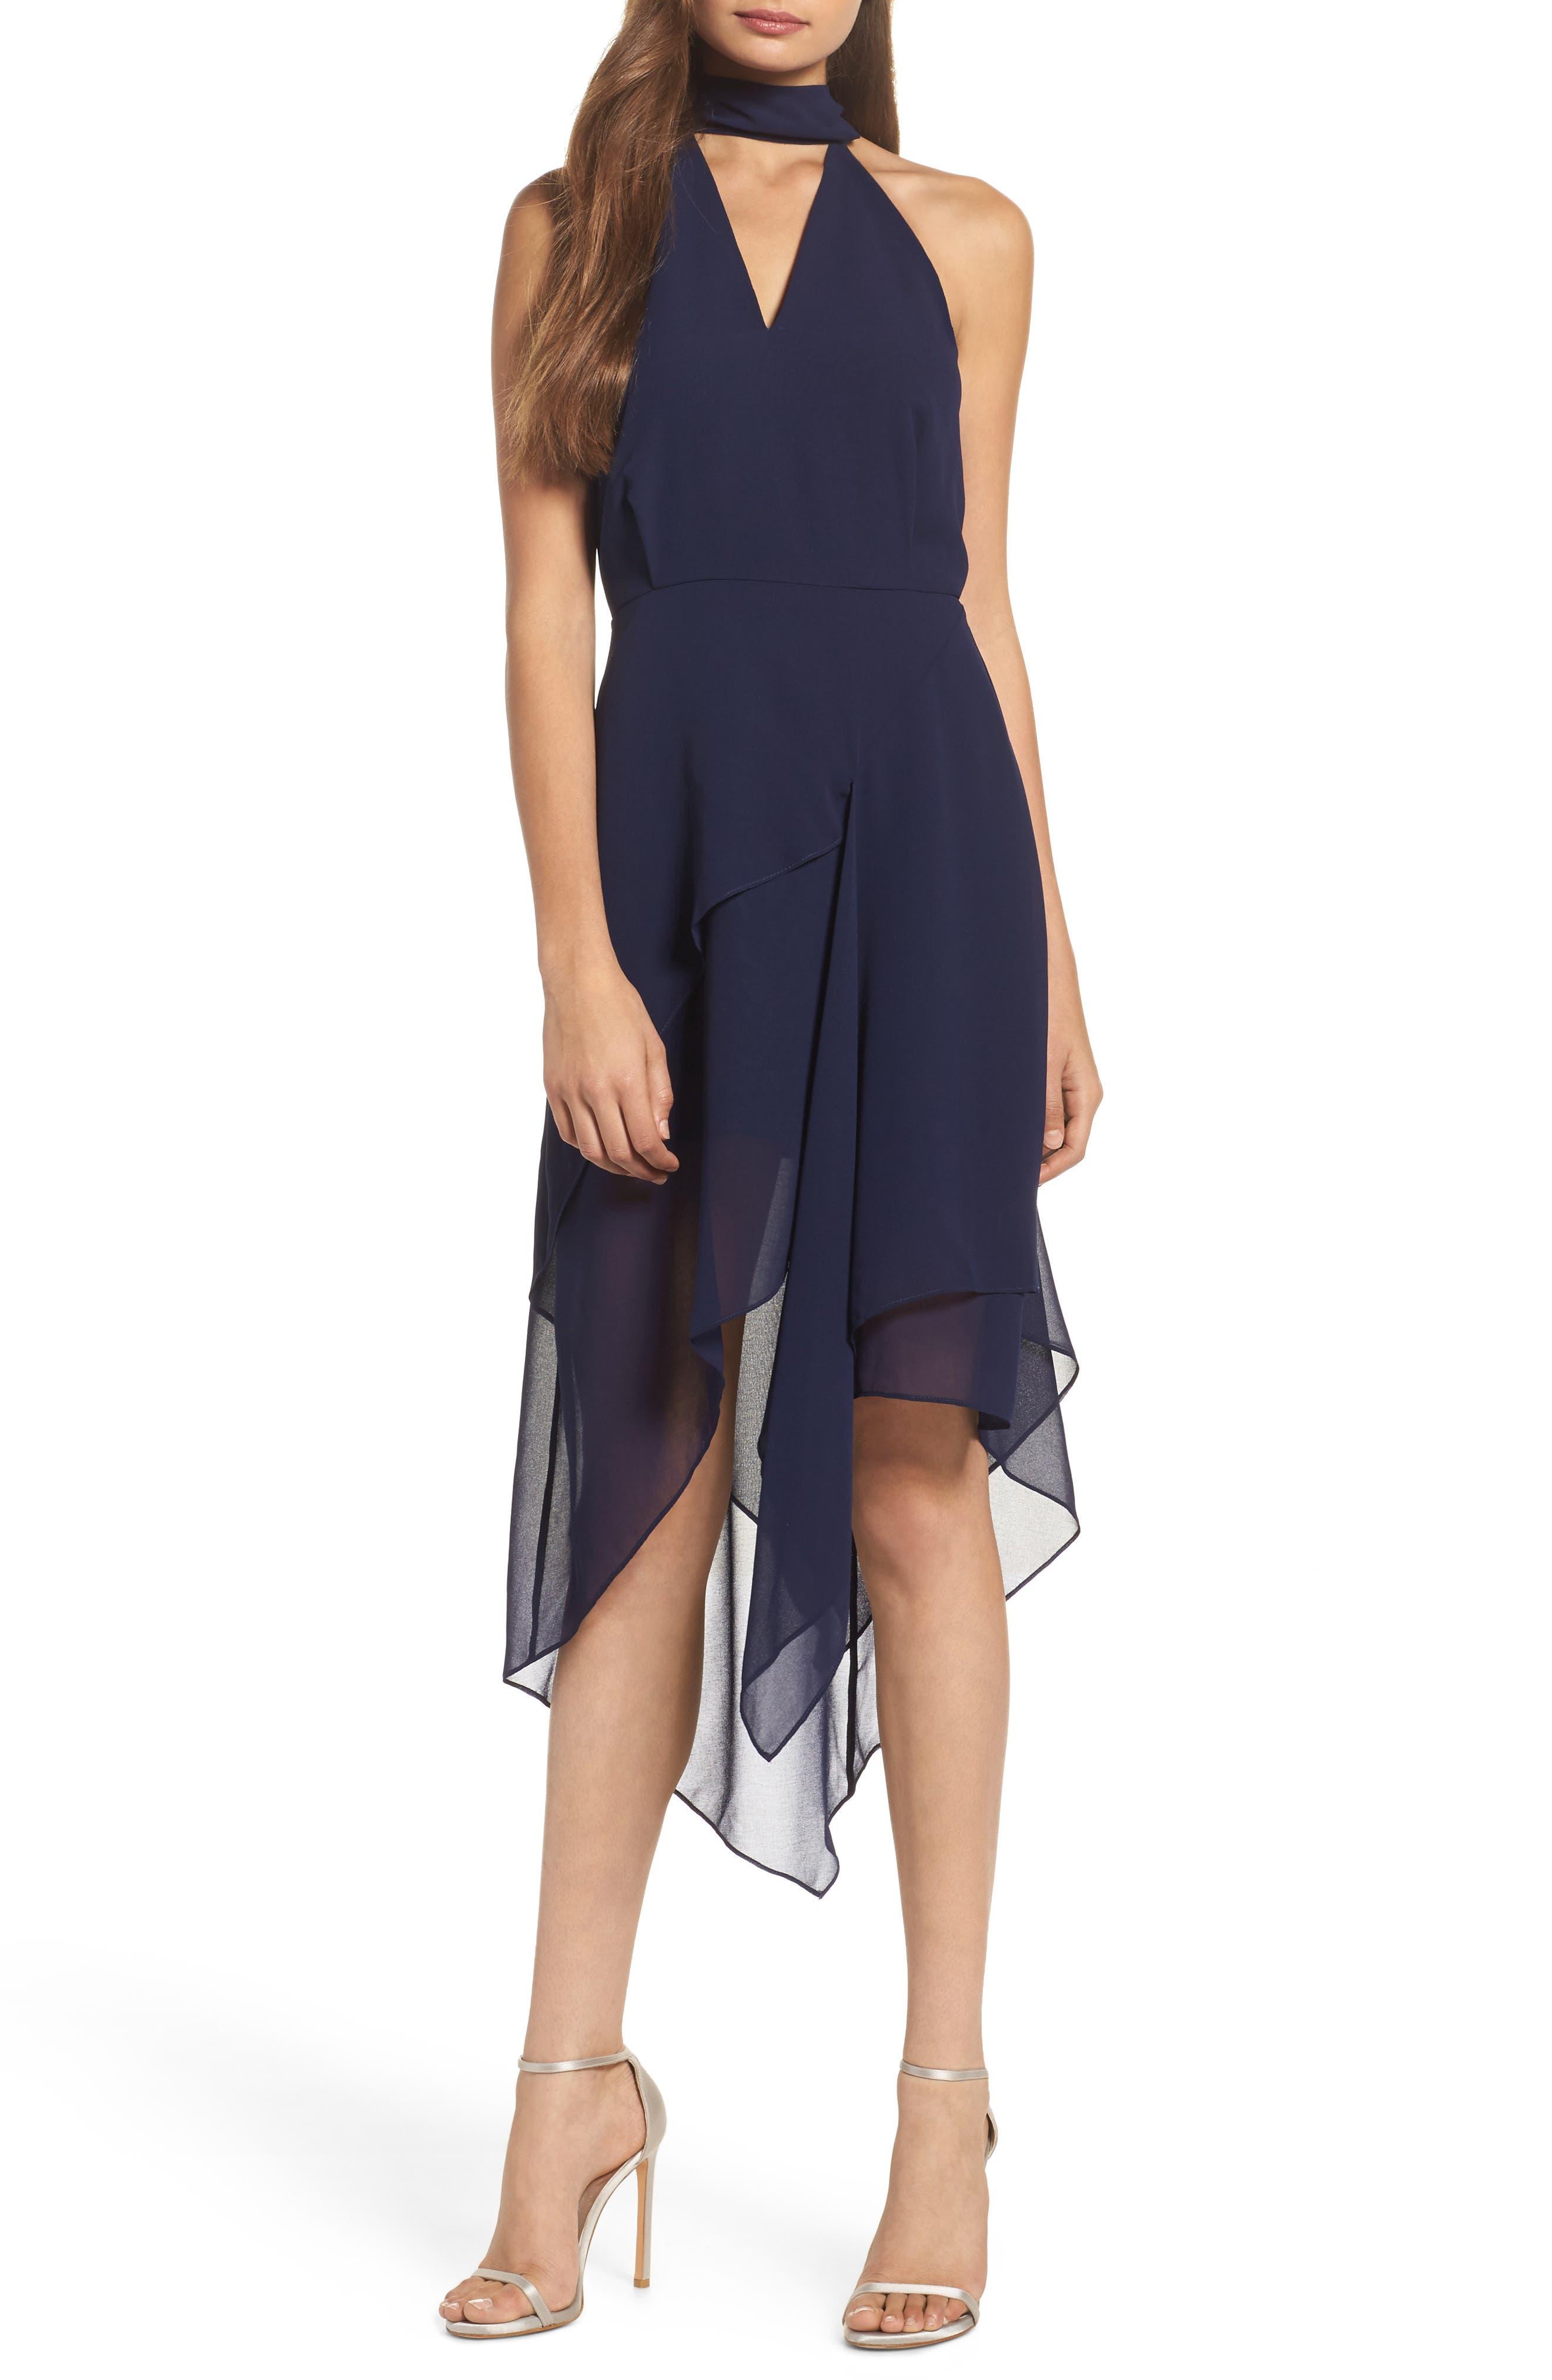 C/MEO Collective Love Burns Halter Dress